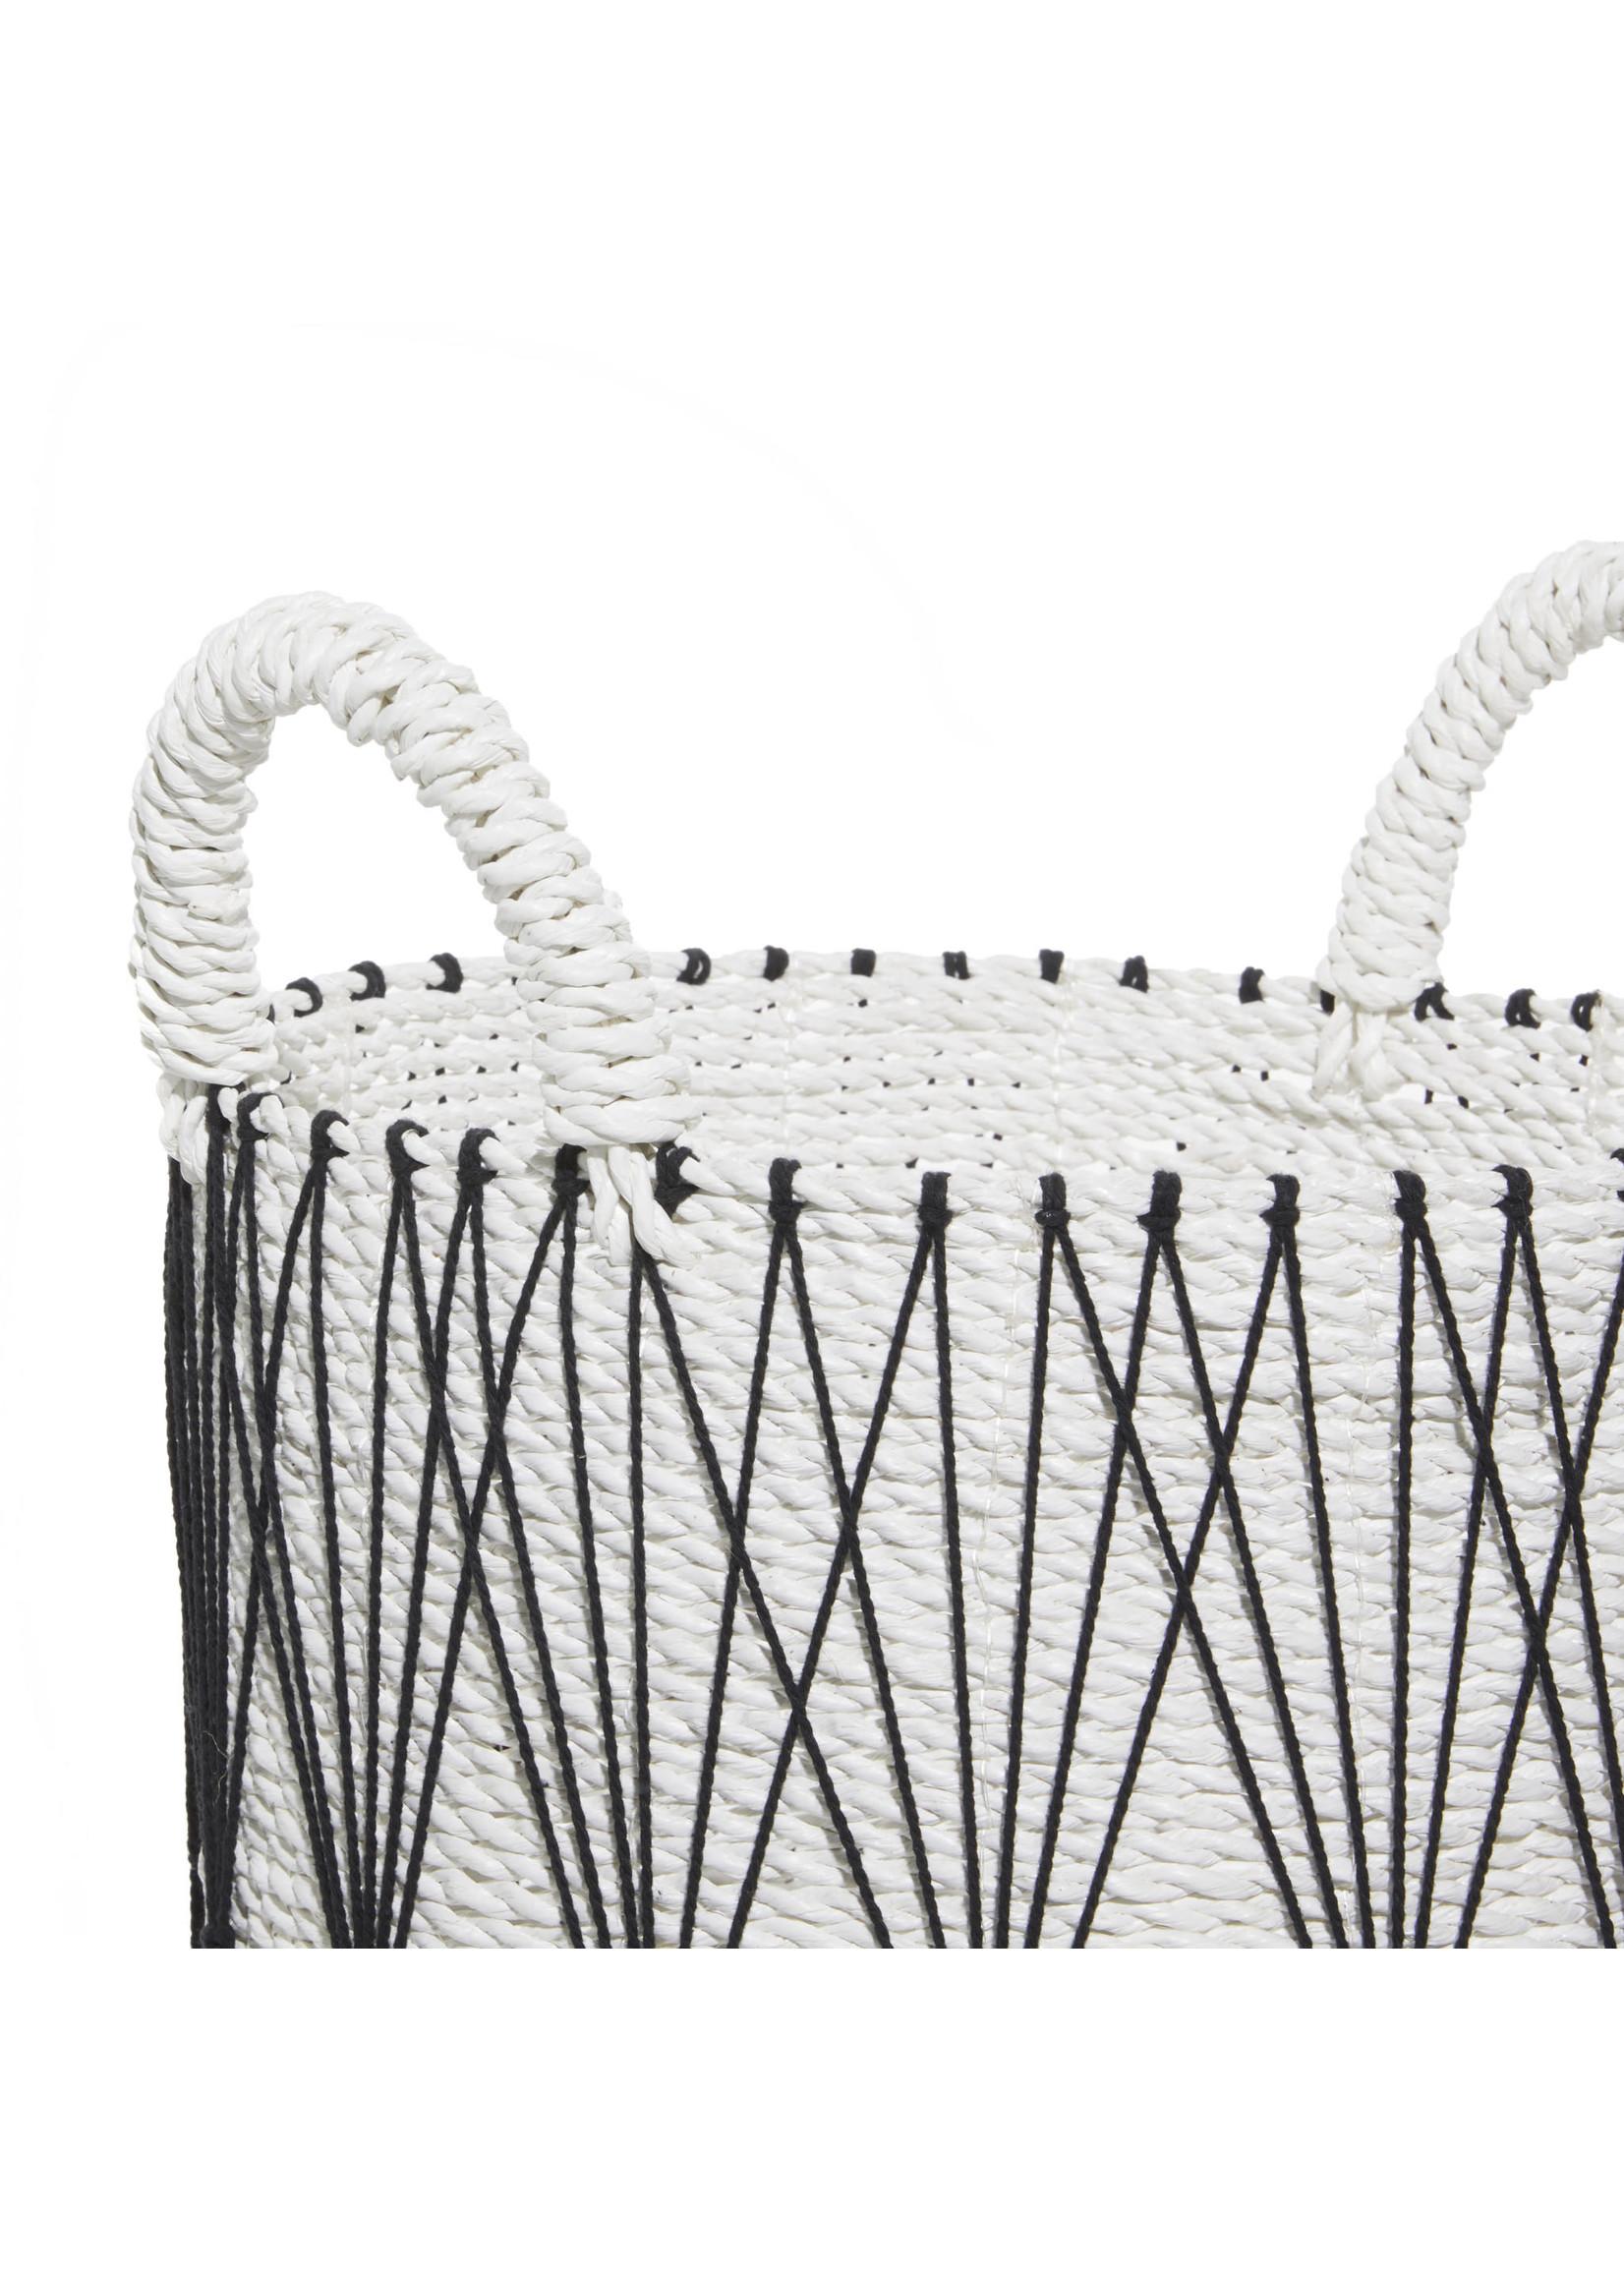 UMA Enterprises Black & White Cotton Basket - Large